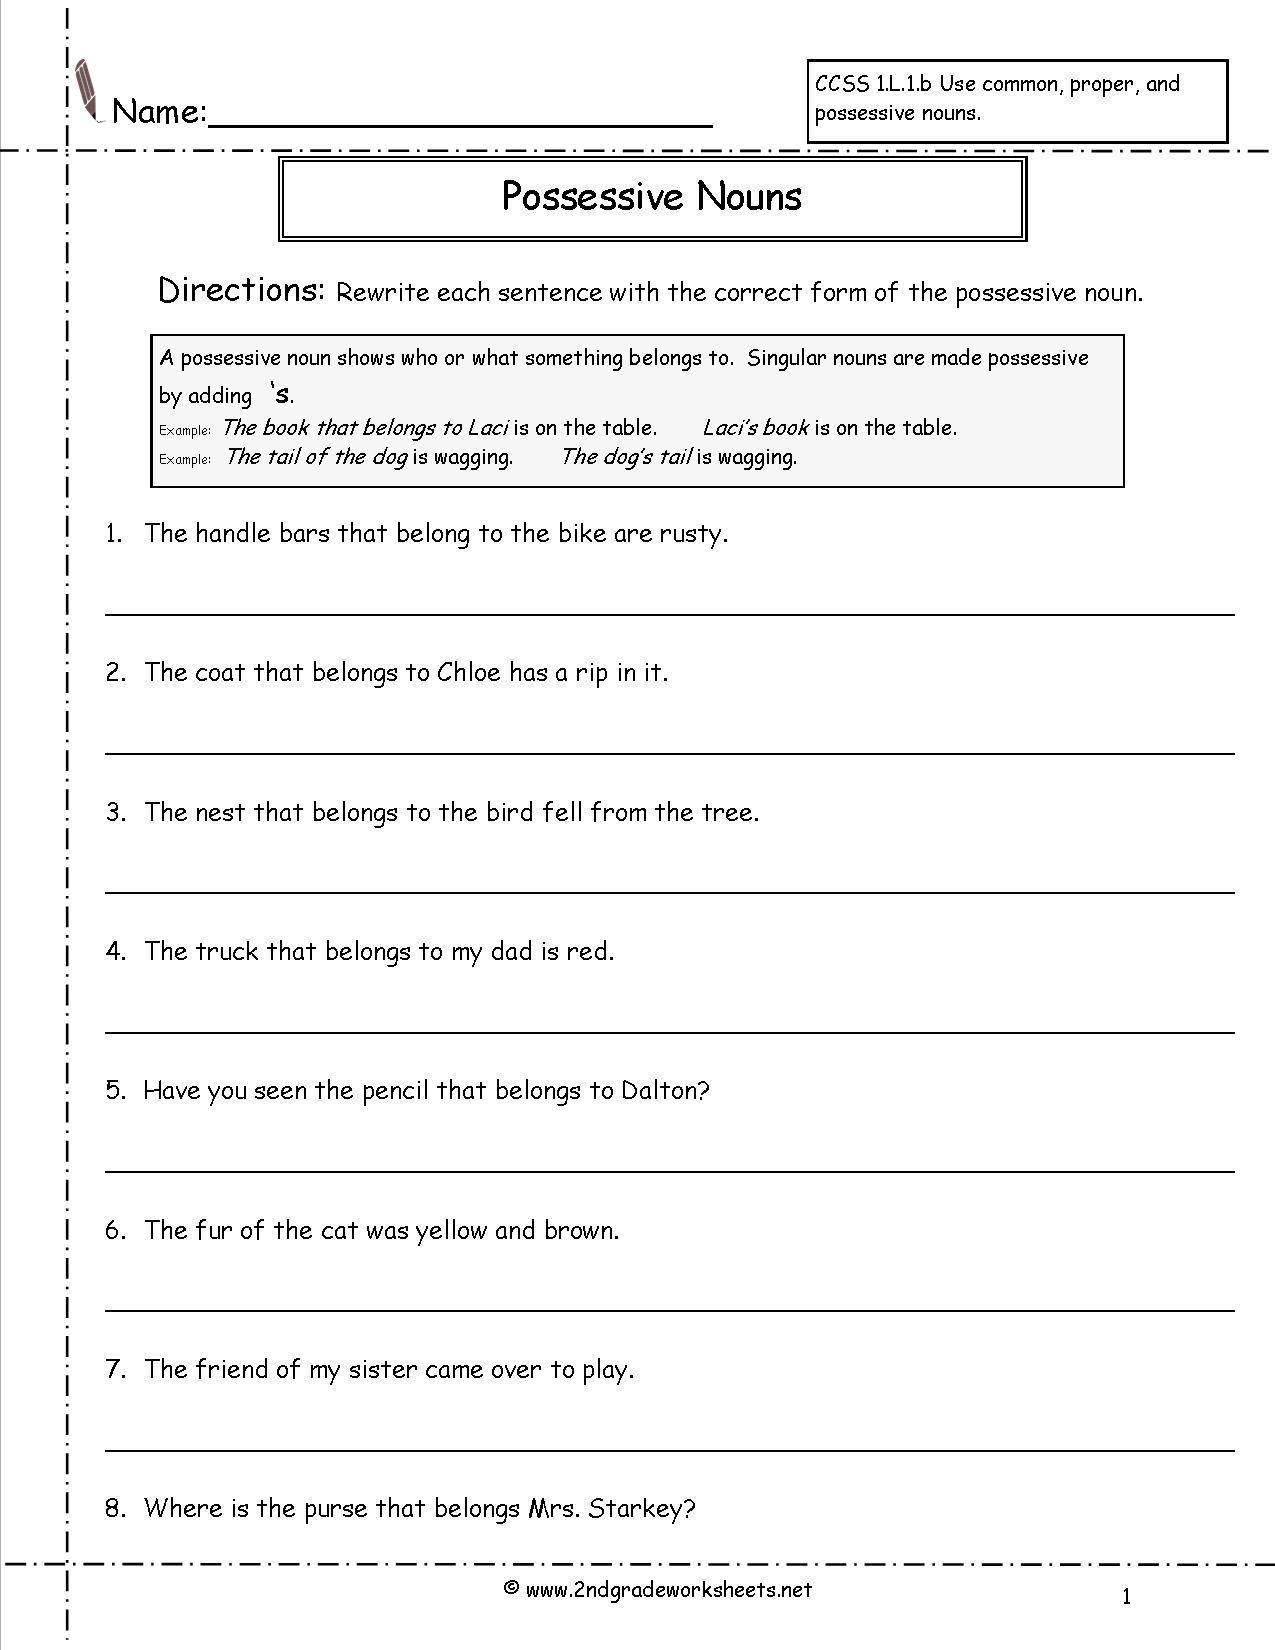 18 Best Images Of Possessive Noun Worksheet 2nd Grade